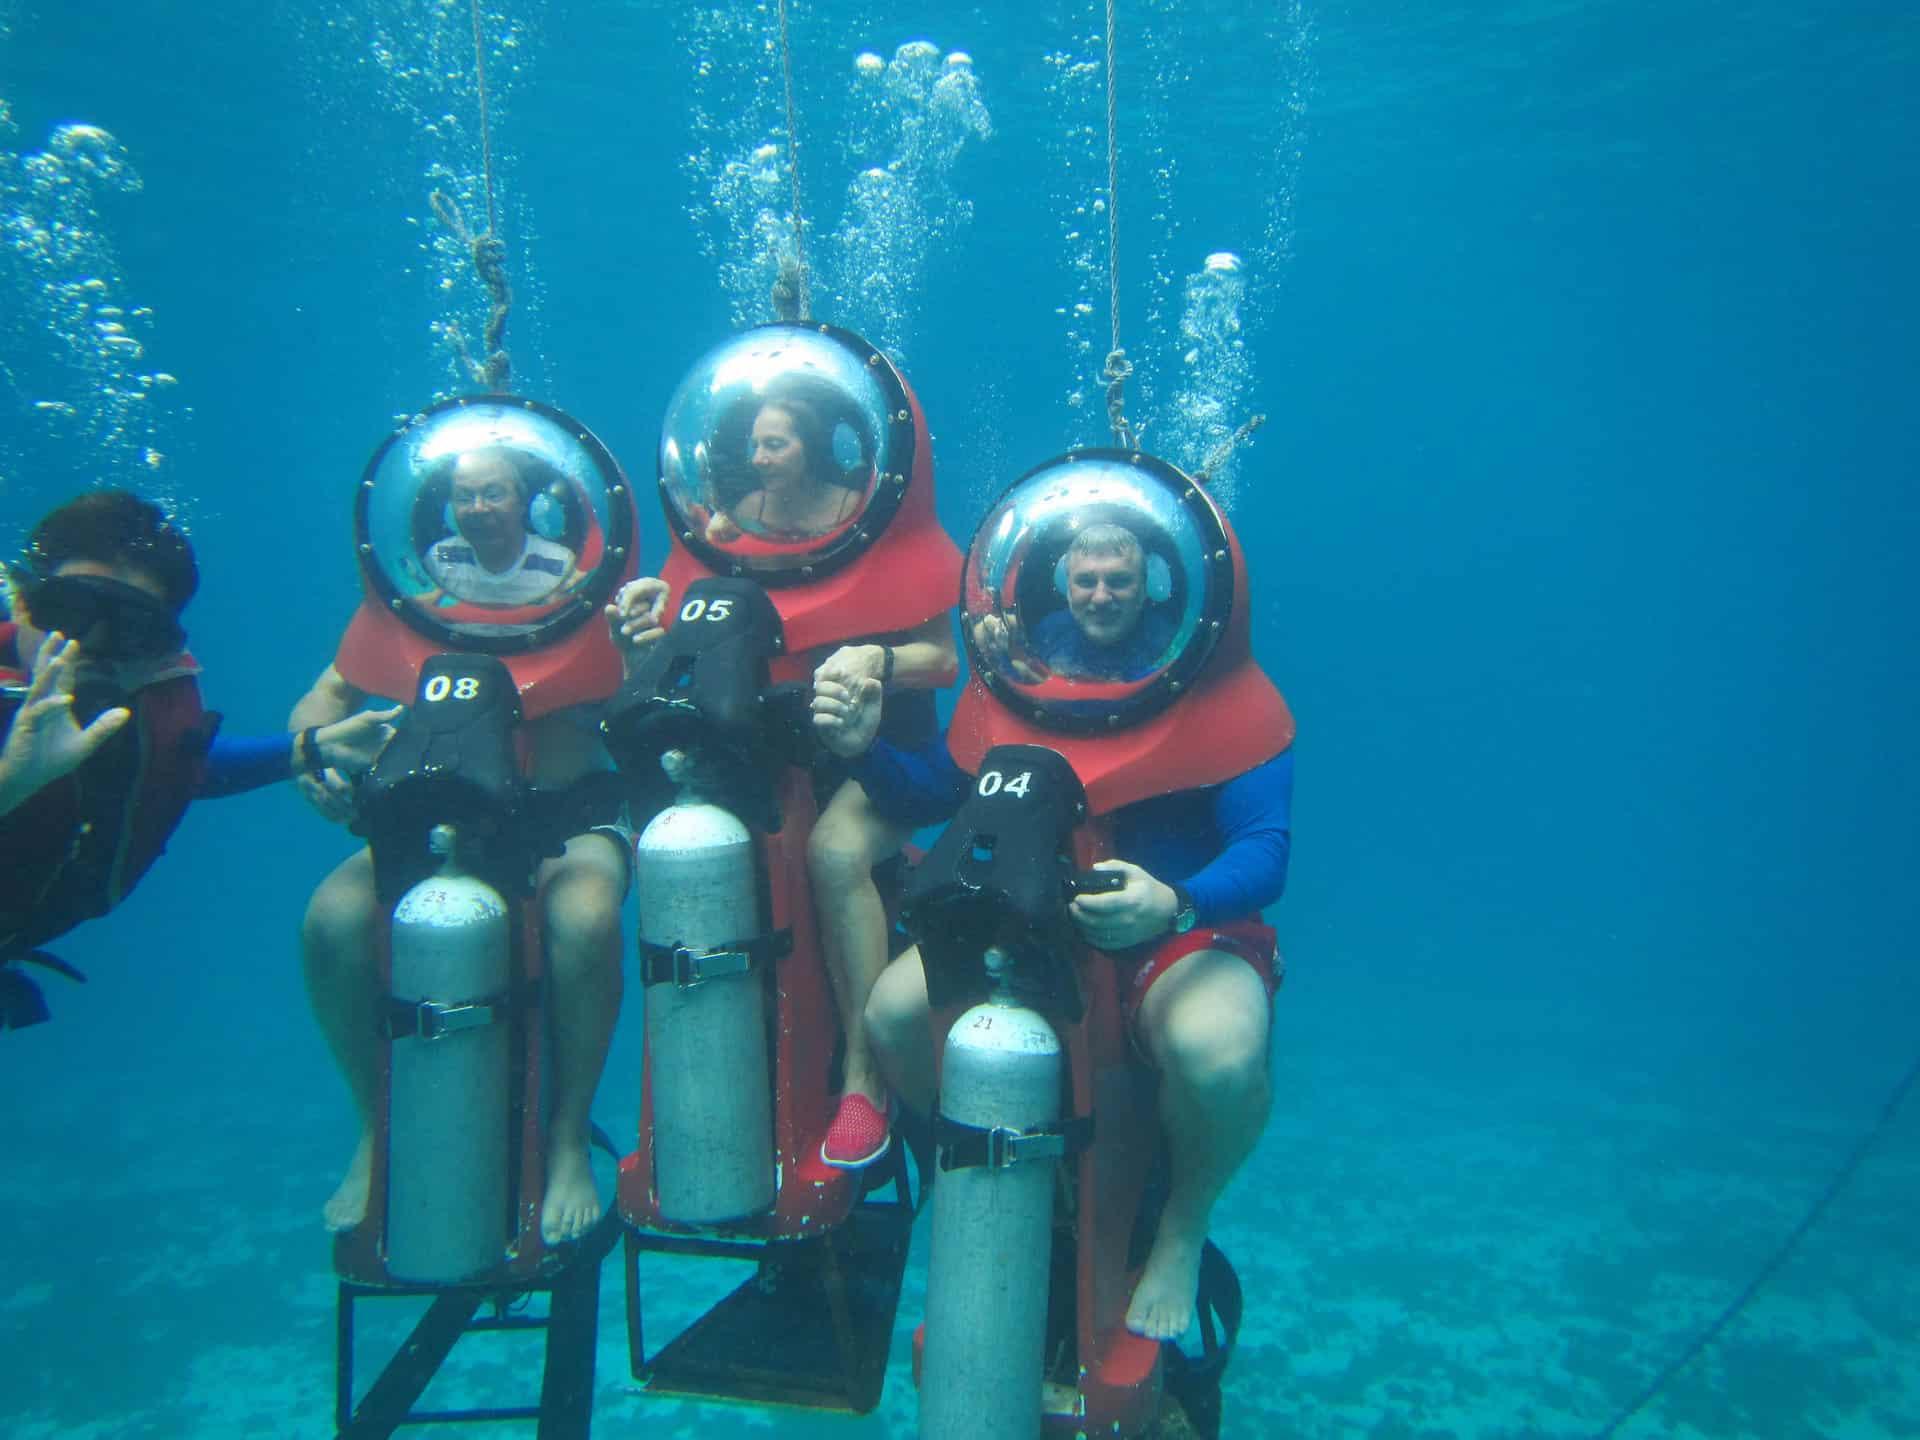 cozumel mini submarine adventure - cozumel cruise excursions